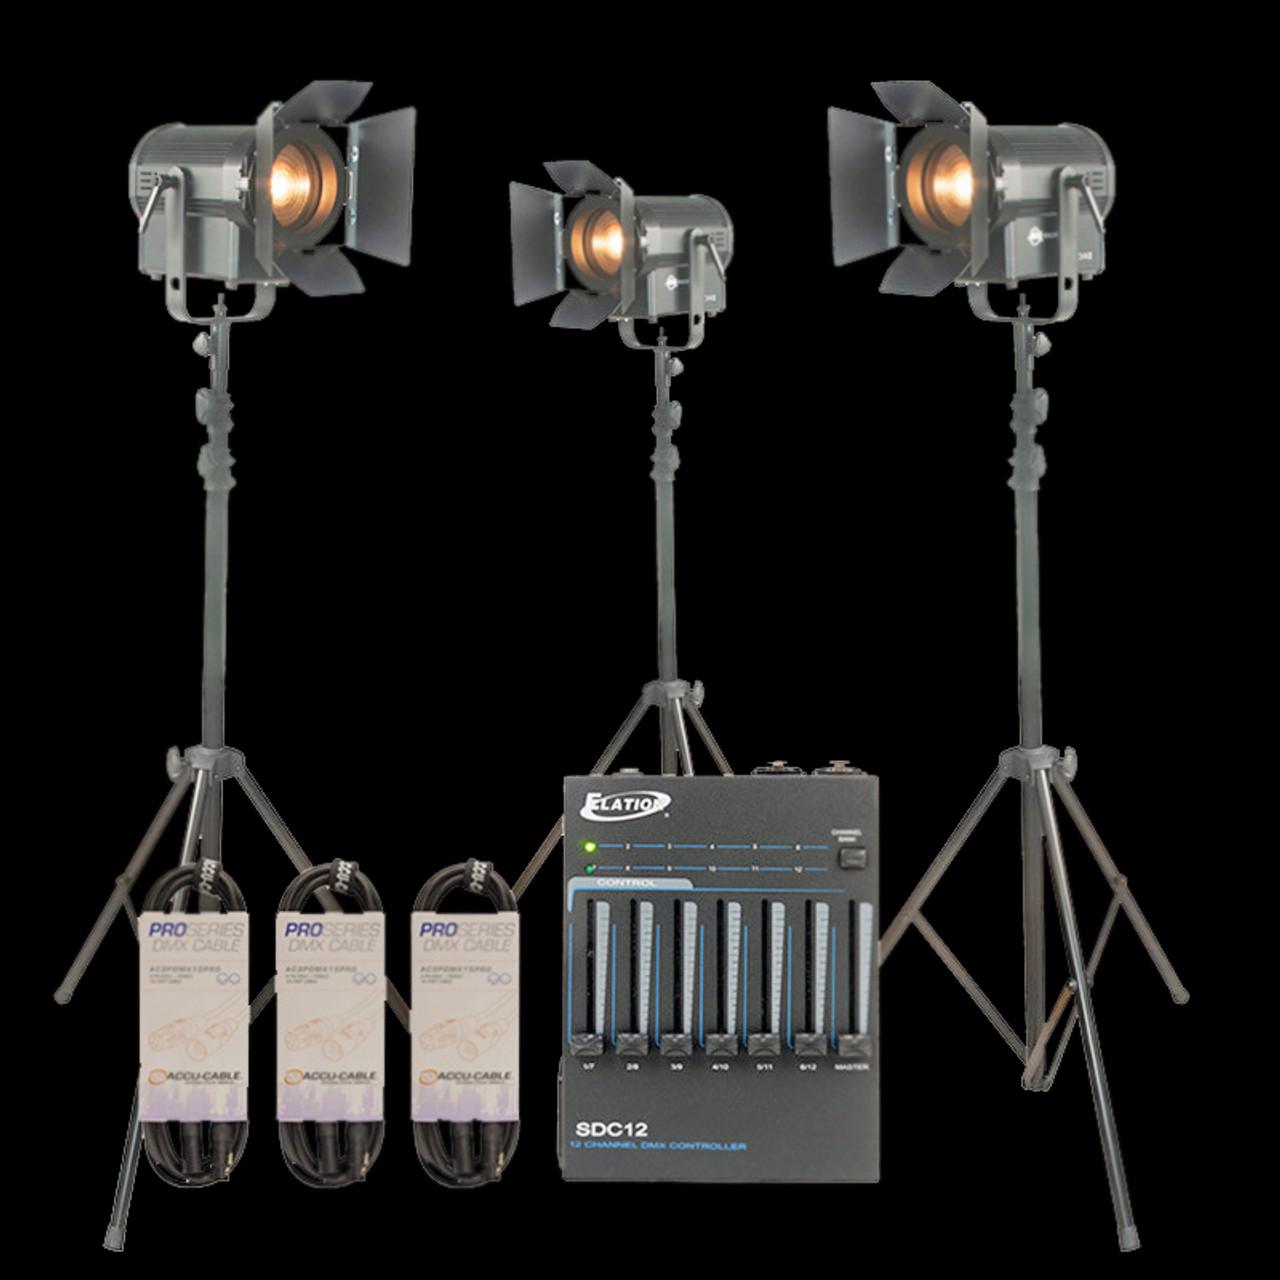 ADJ Basic Stream PAK Production Lighting Package